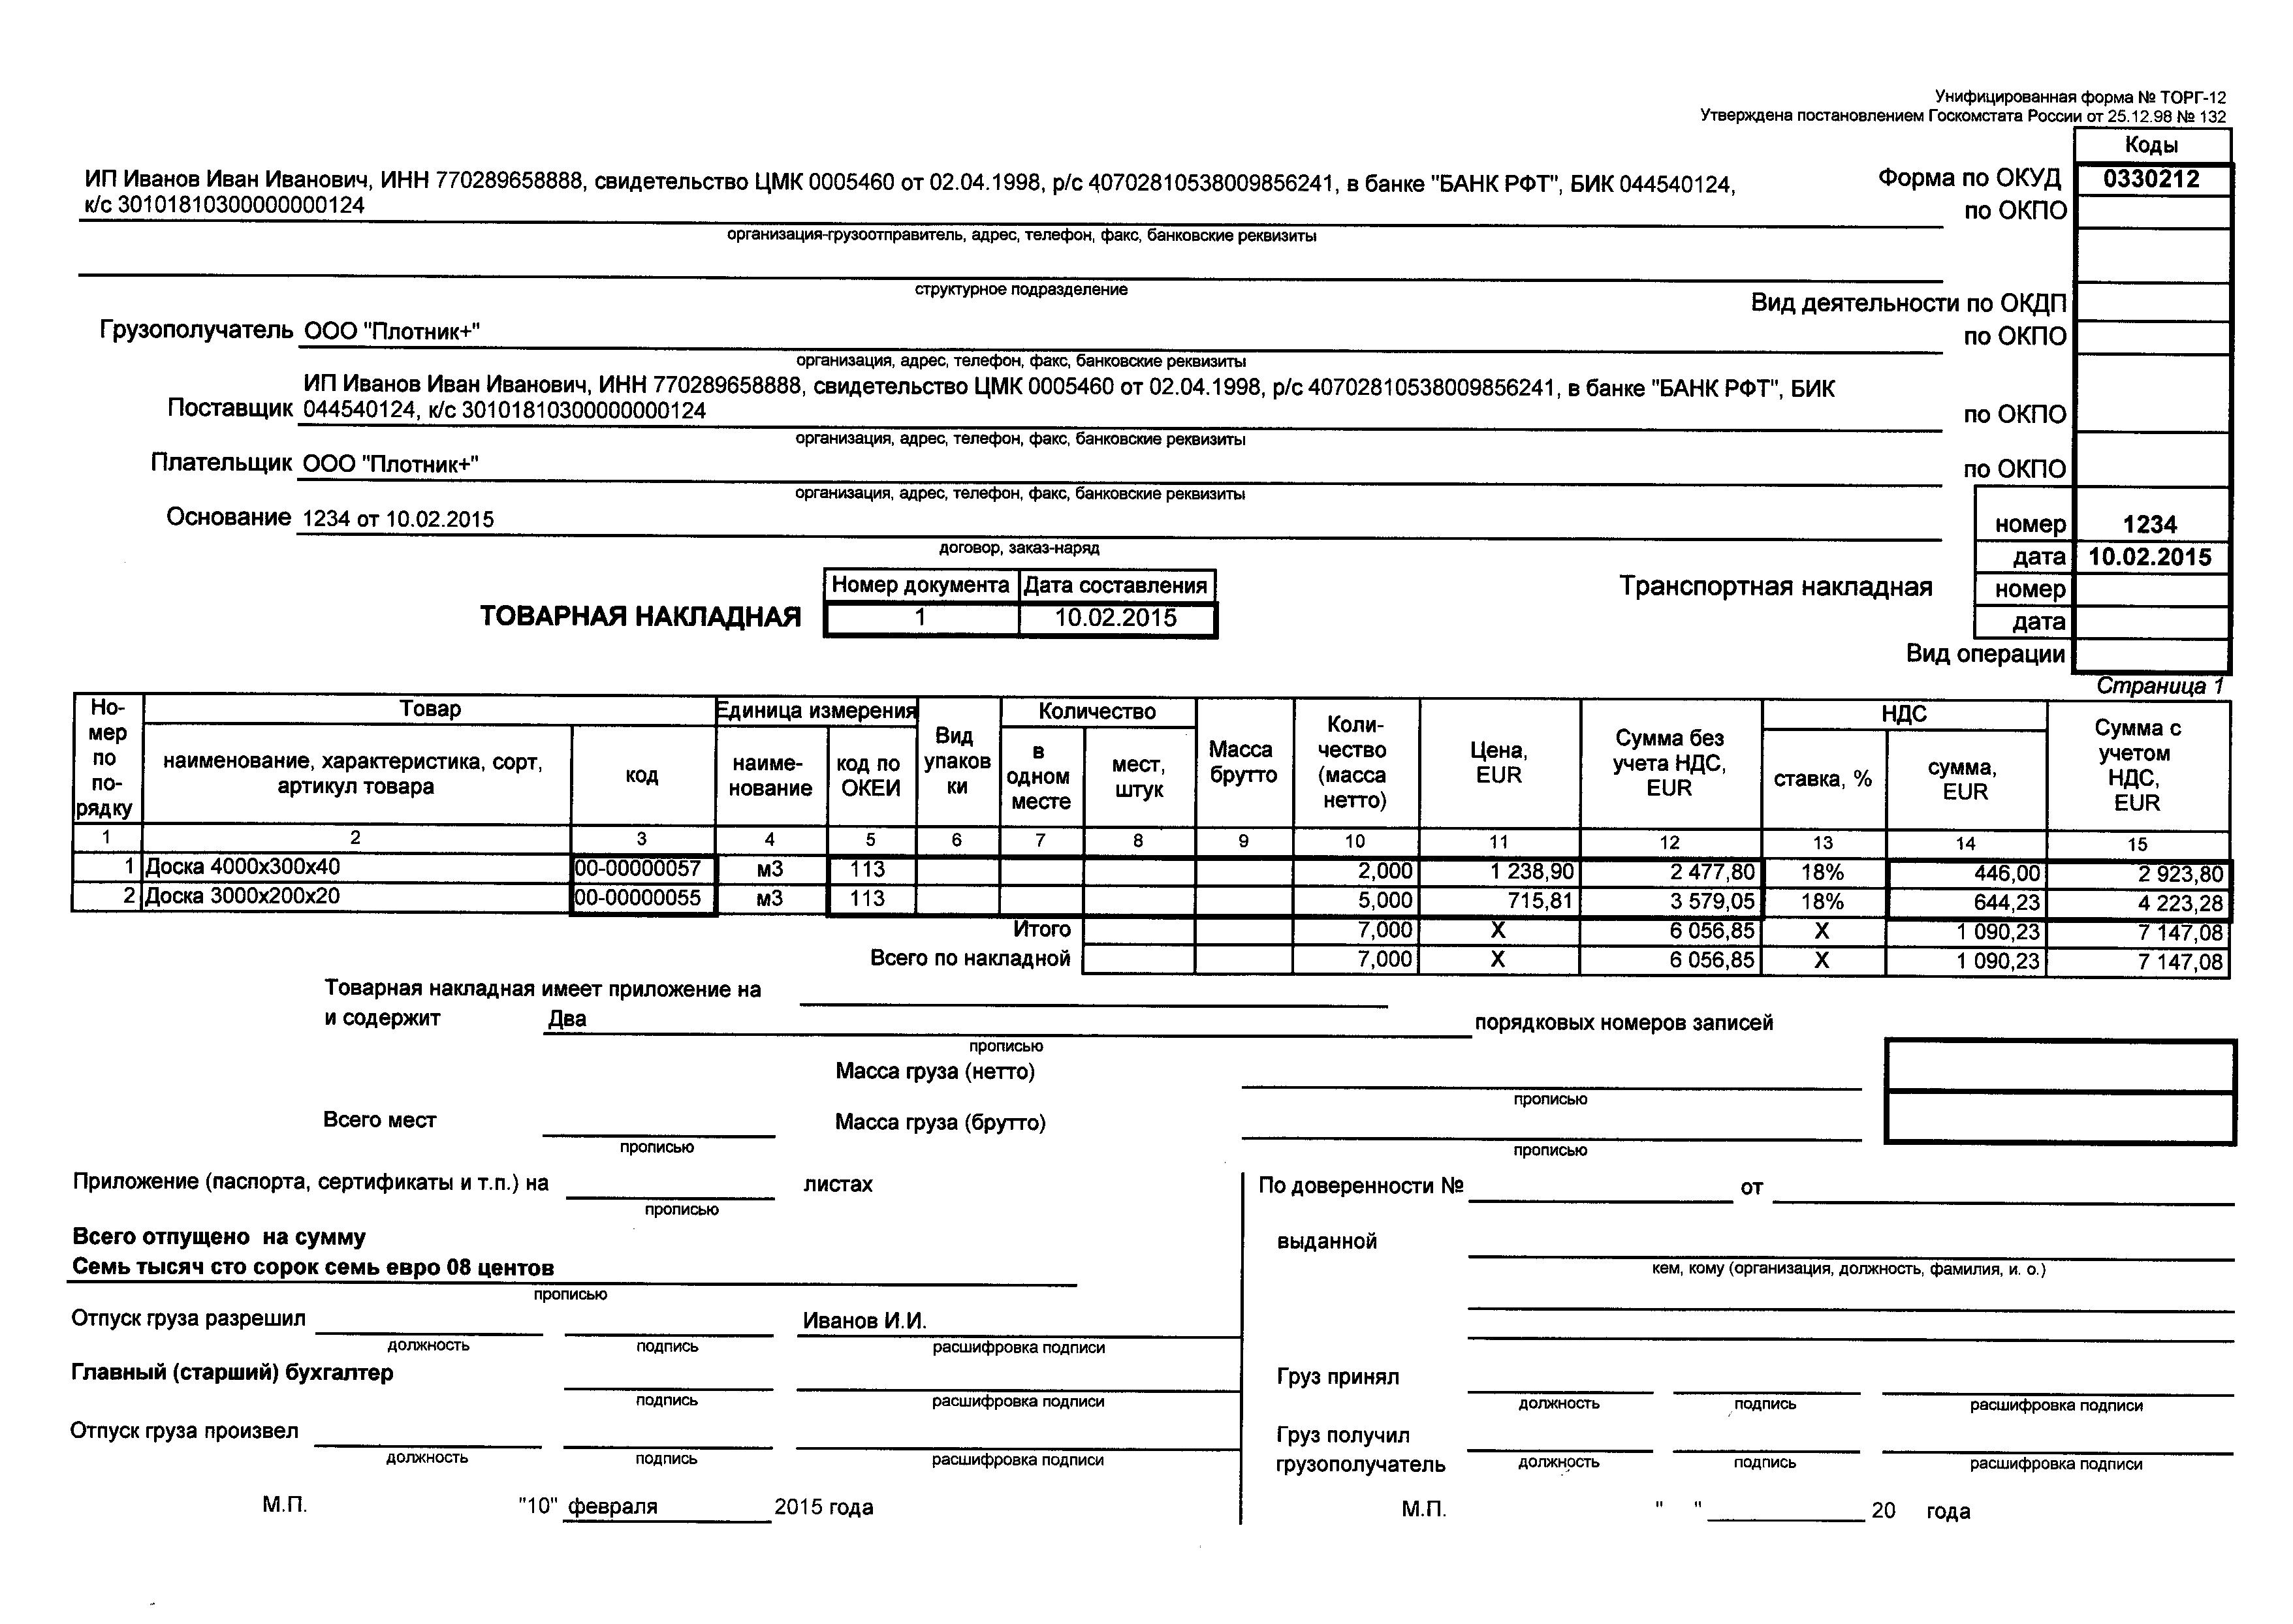 ТОРГ-12 в валюте документа